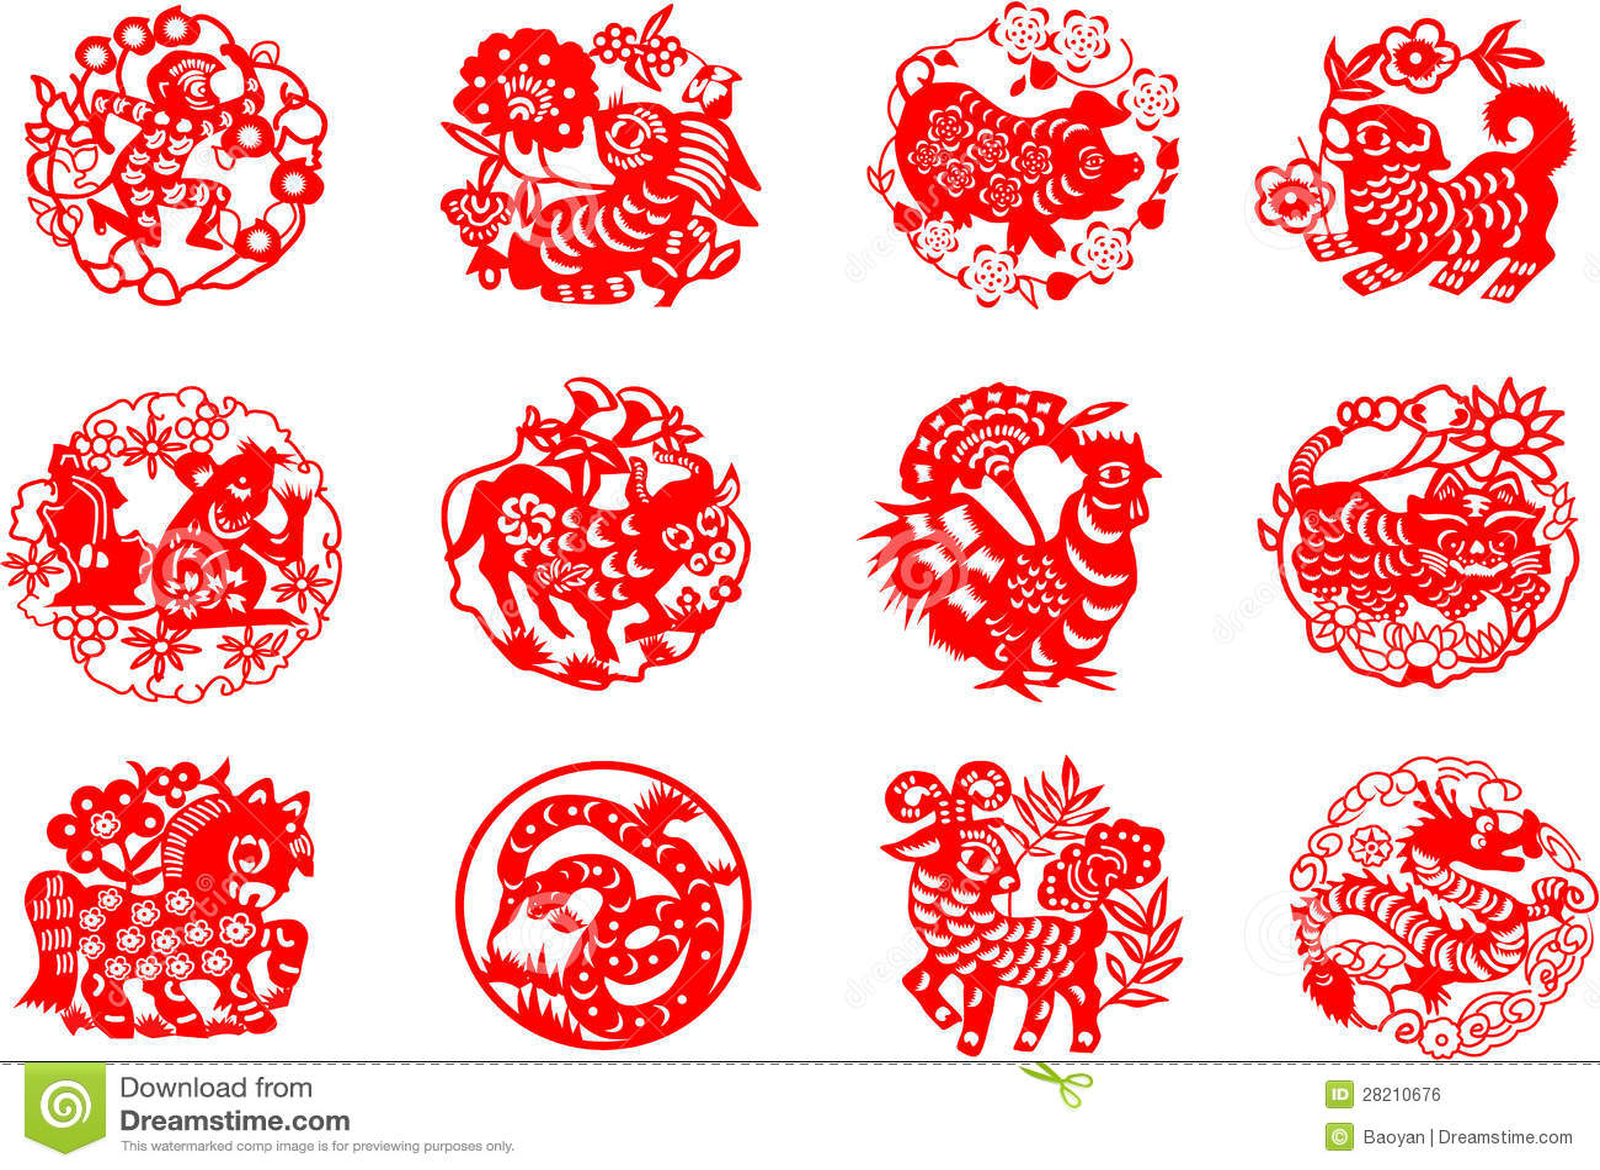 Animals Of Chinese Calendar Royalty Free Stock Image - Image: 28210676